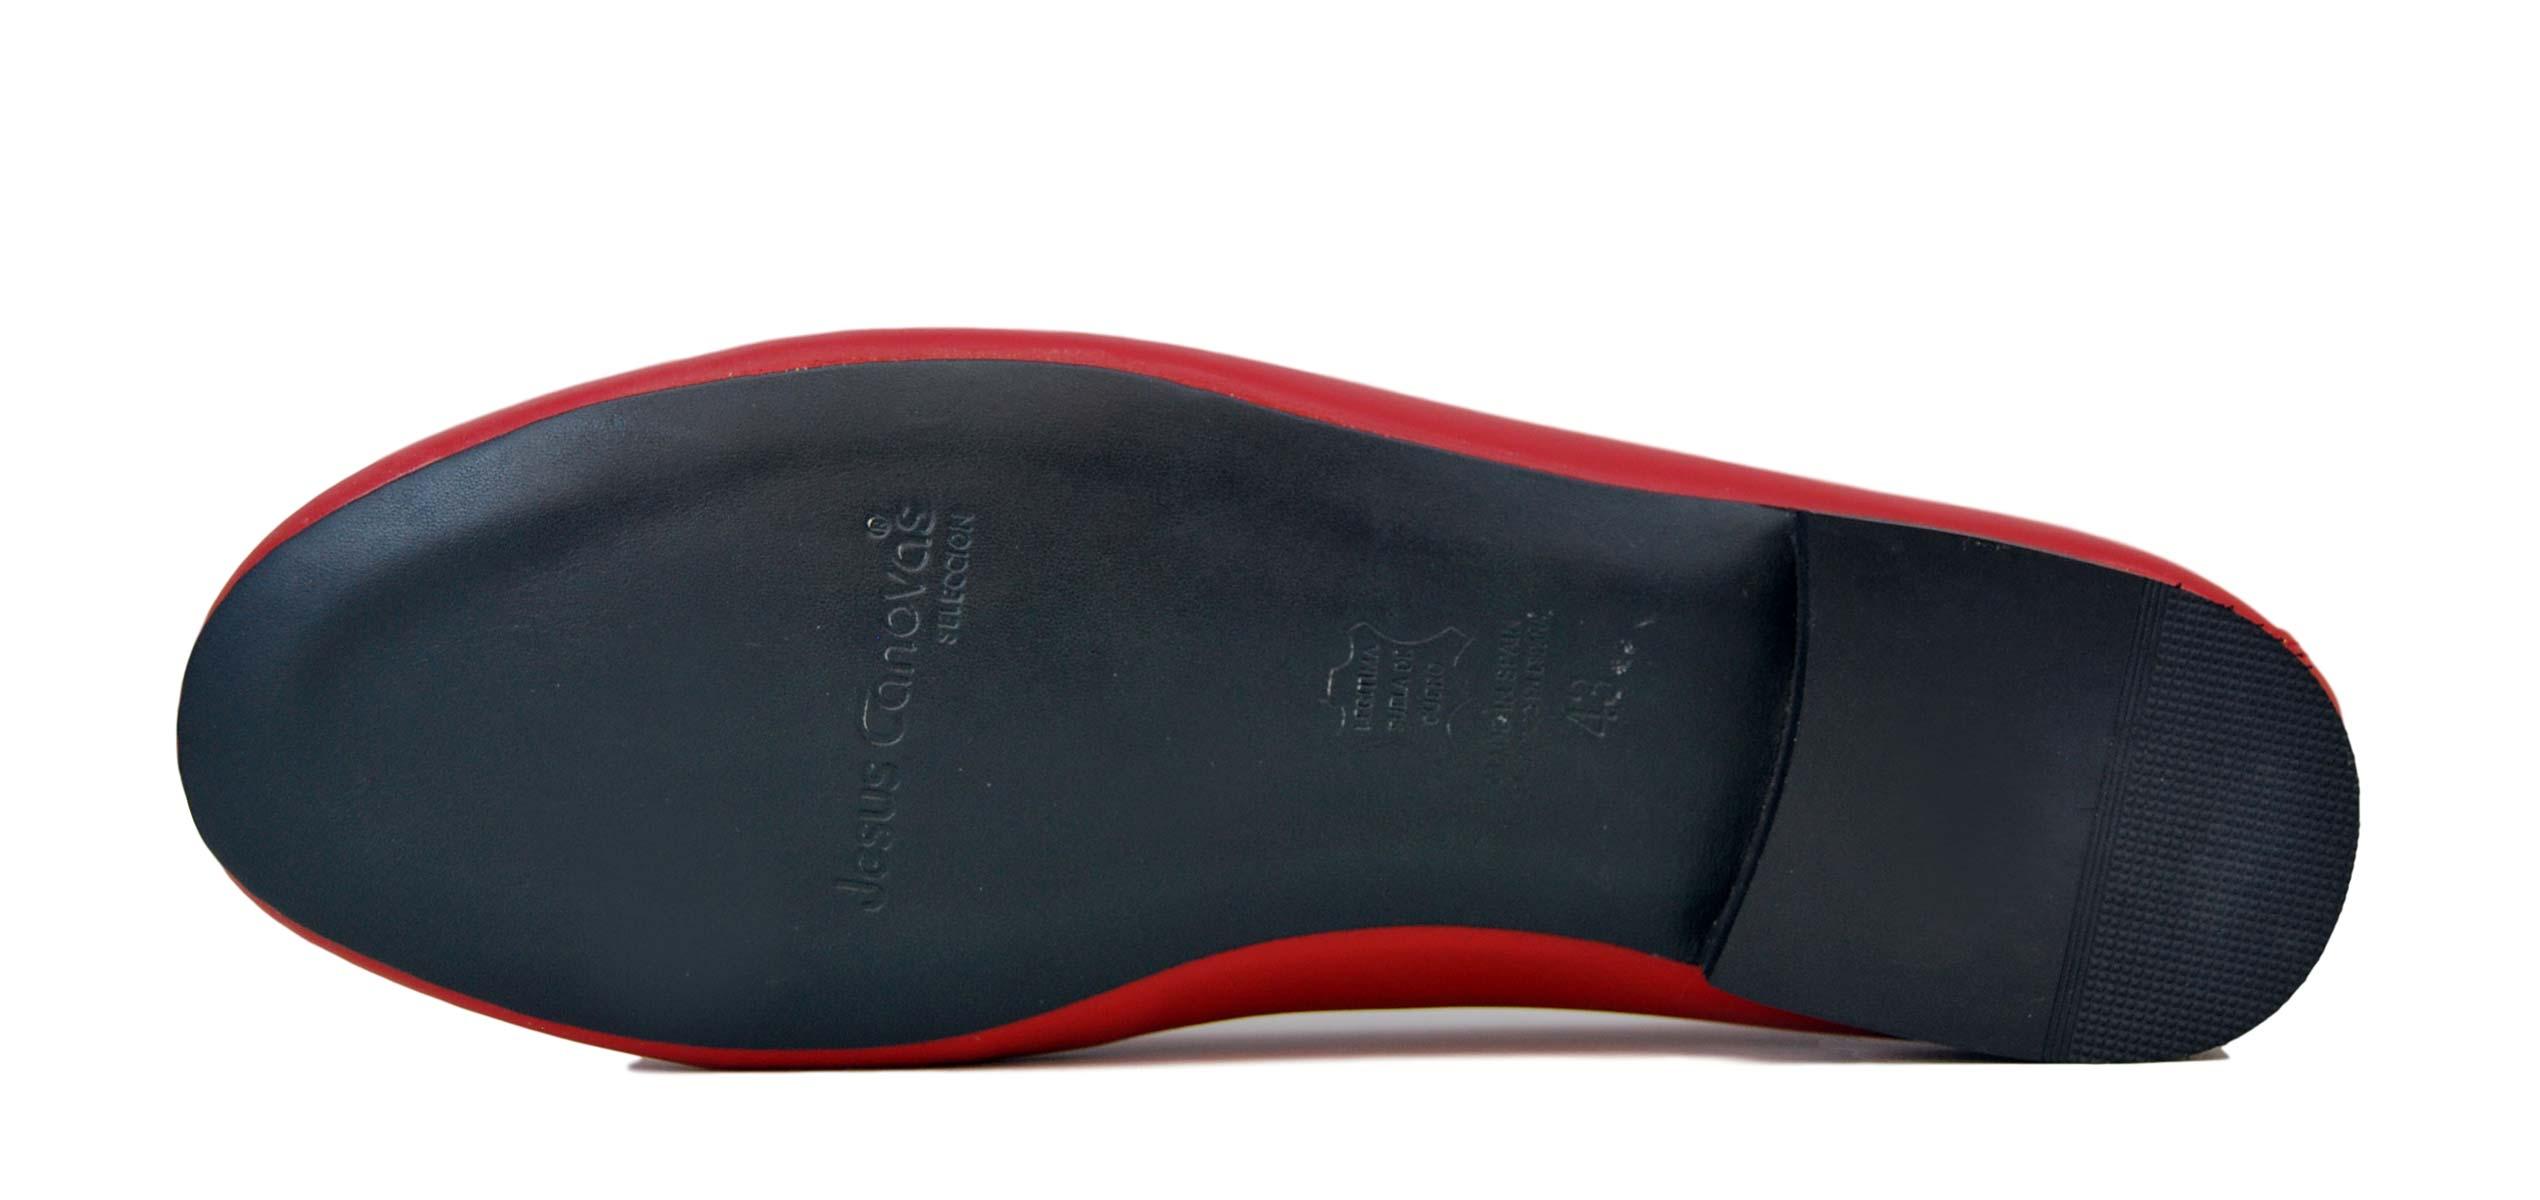 Foto 3 de Zapatos Julio Iglesias Mocasin 528 JC Rojo Napa